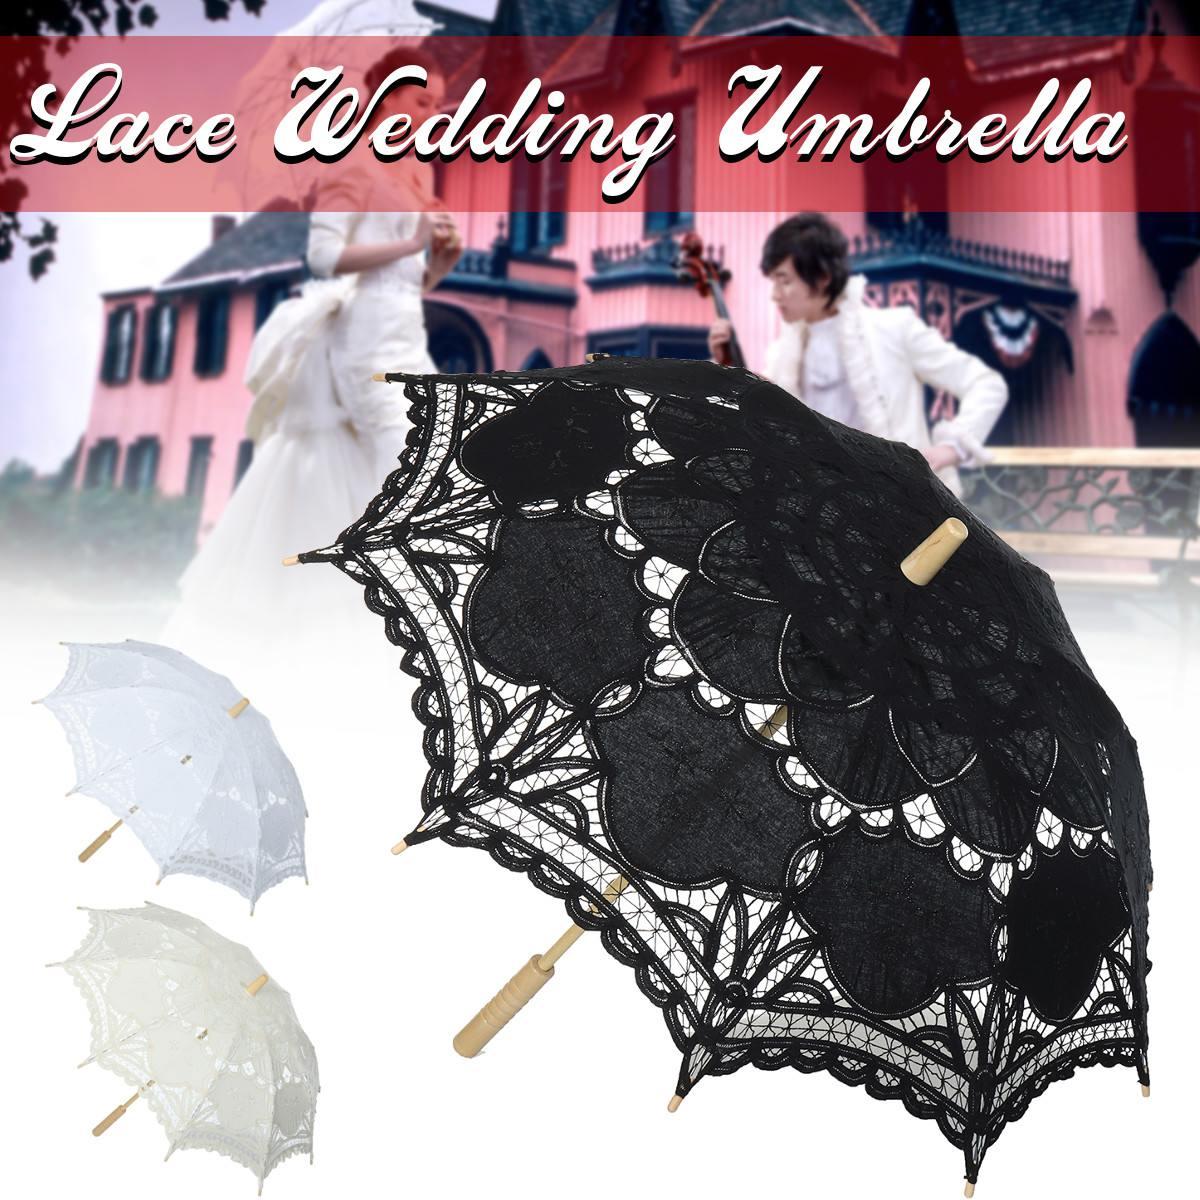 Long Handle Handmade Art Wedding Embroidery Pure Cotton Lace Wedding Umbrella Parasol Romantic Bridal Photograph Party Decor